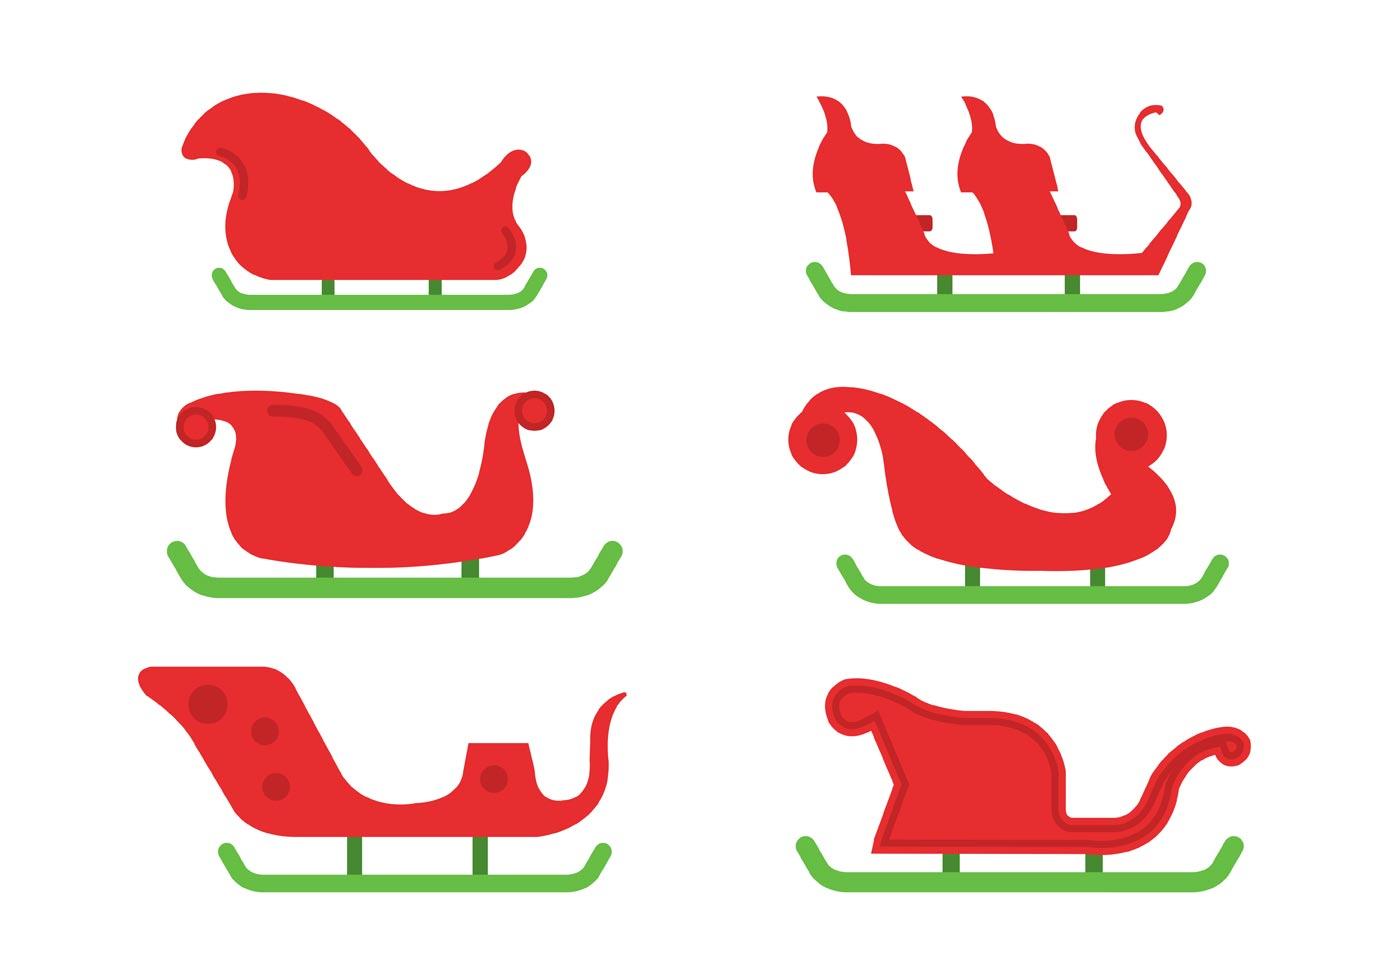 Santa's Sleigh Vector Set - Download Free Vector Art, Stock Graphics ...